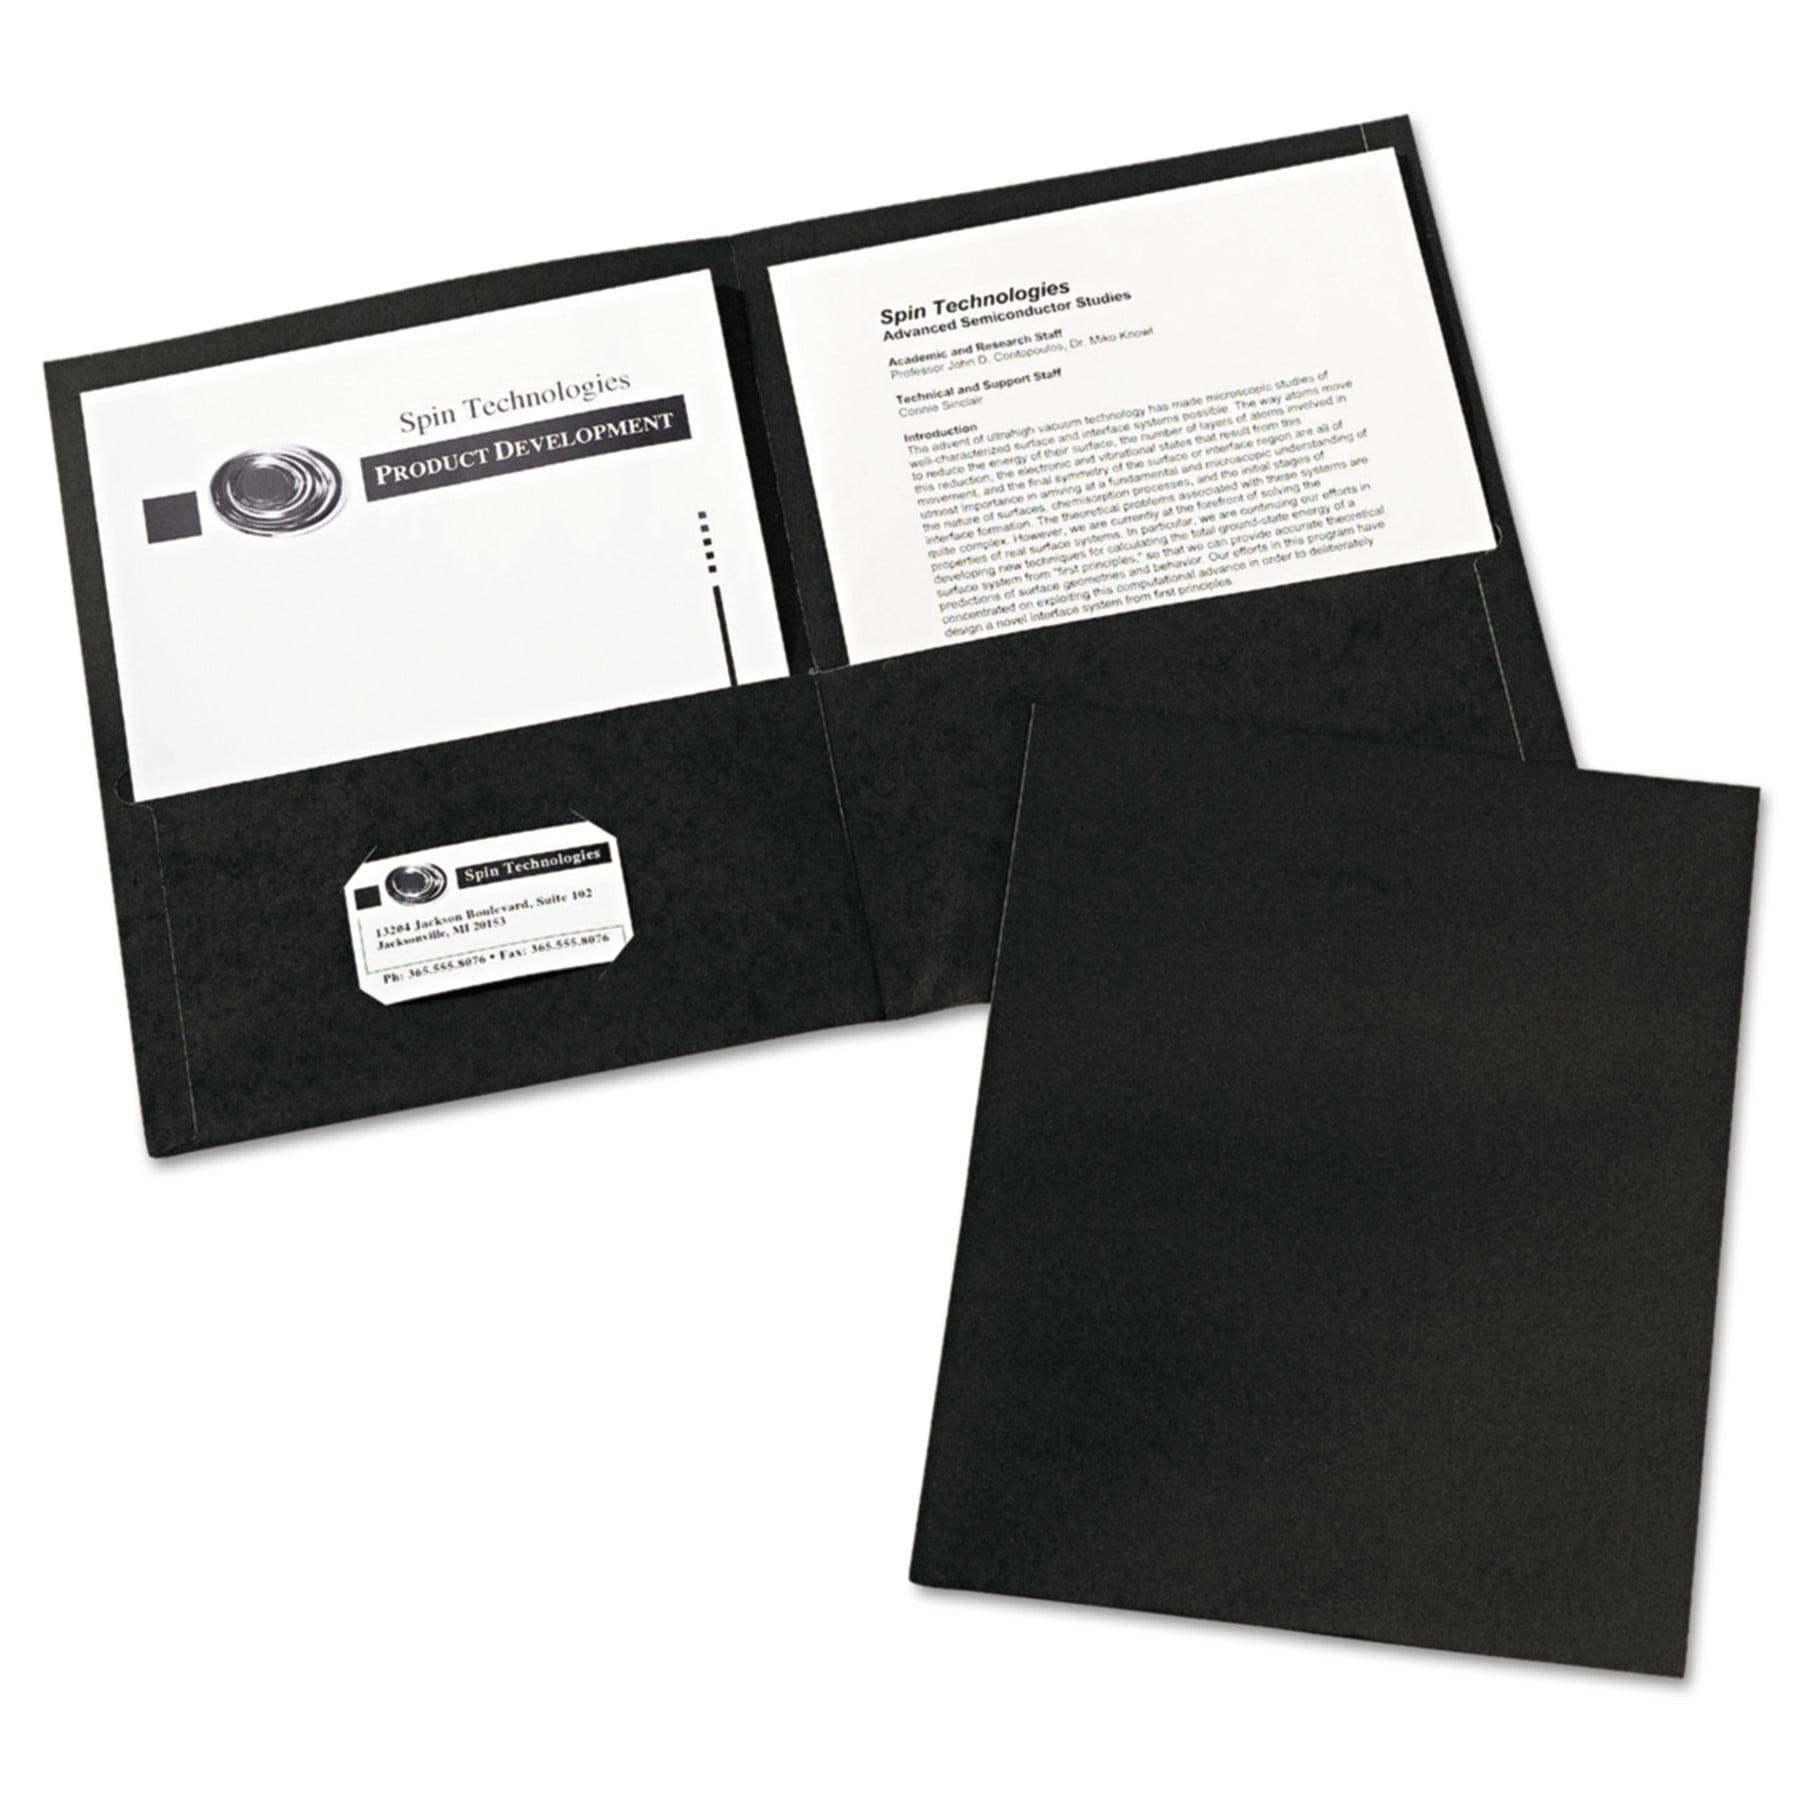 Avery(R) Two-Pocket Folders 47988, Black, Box of 25